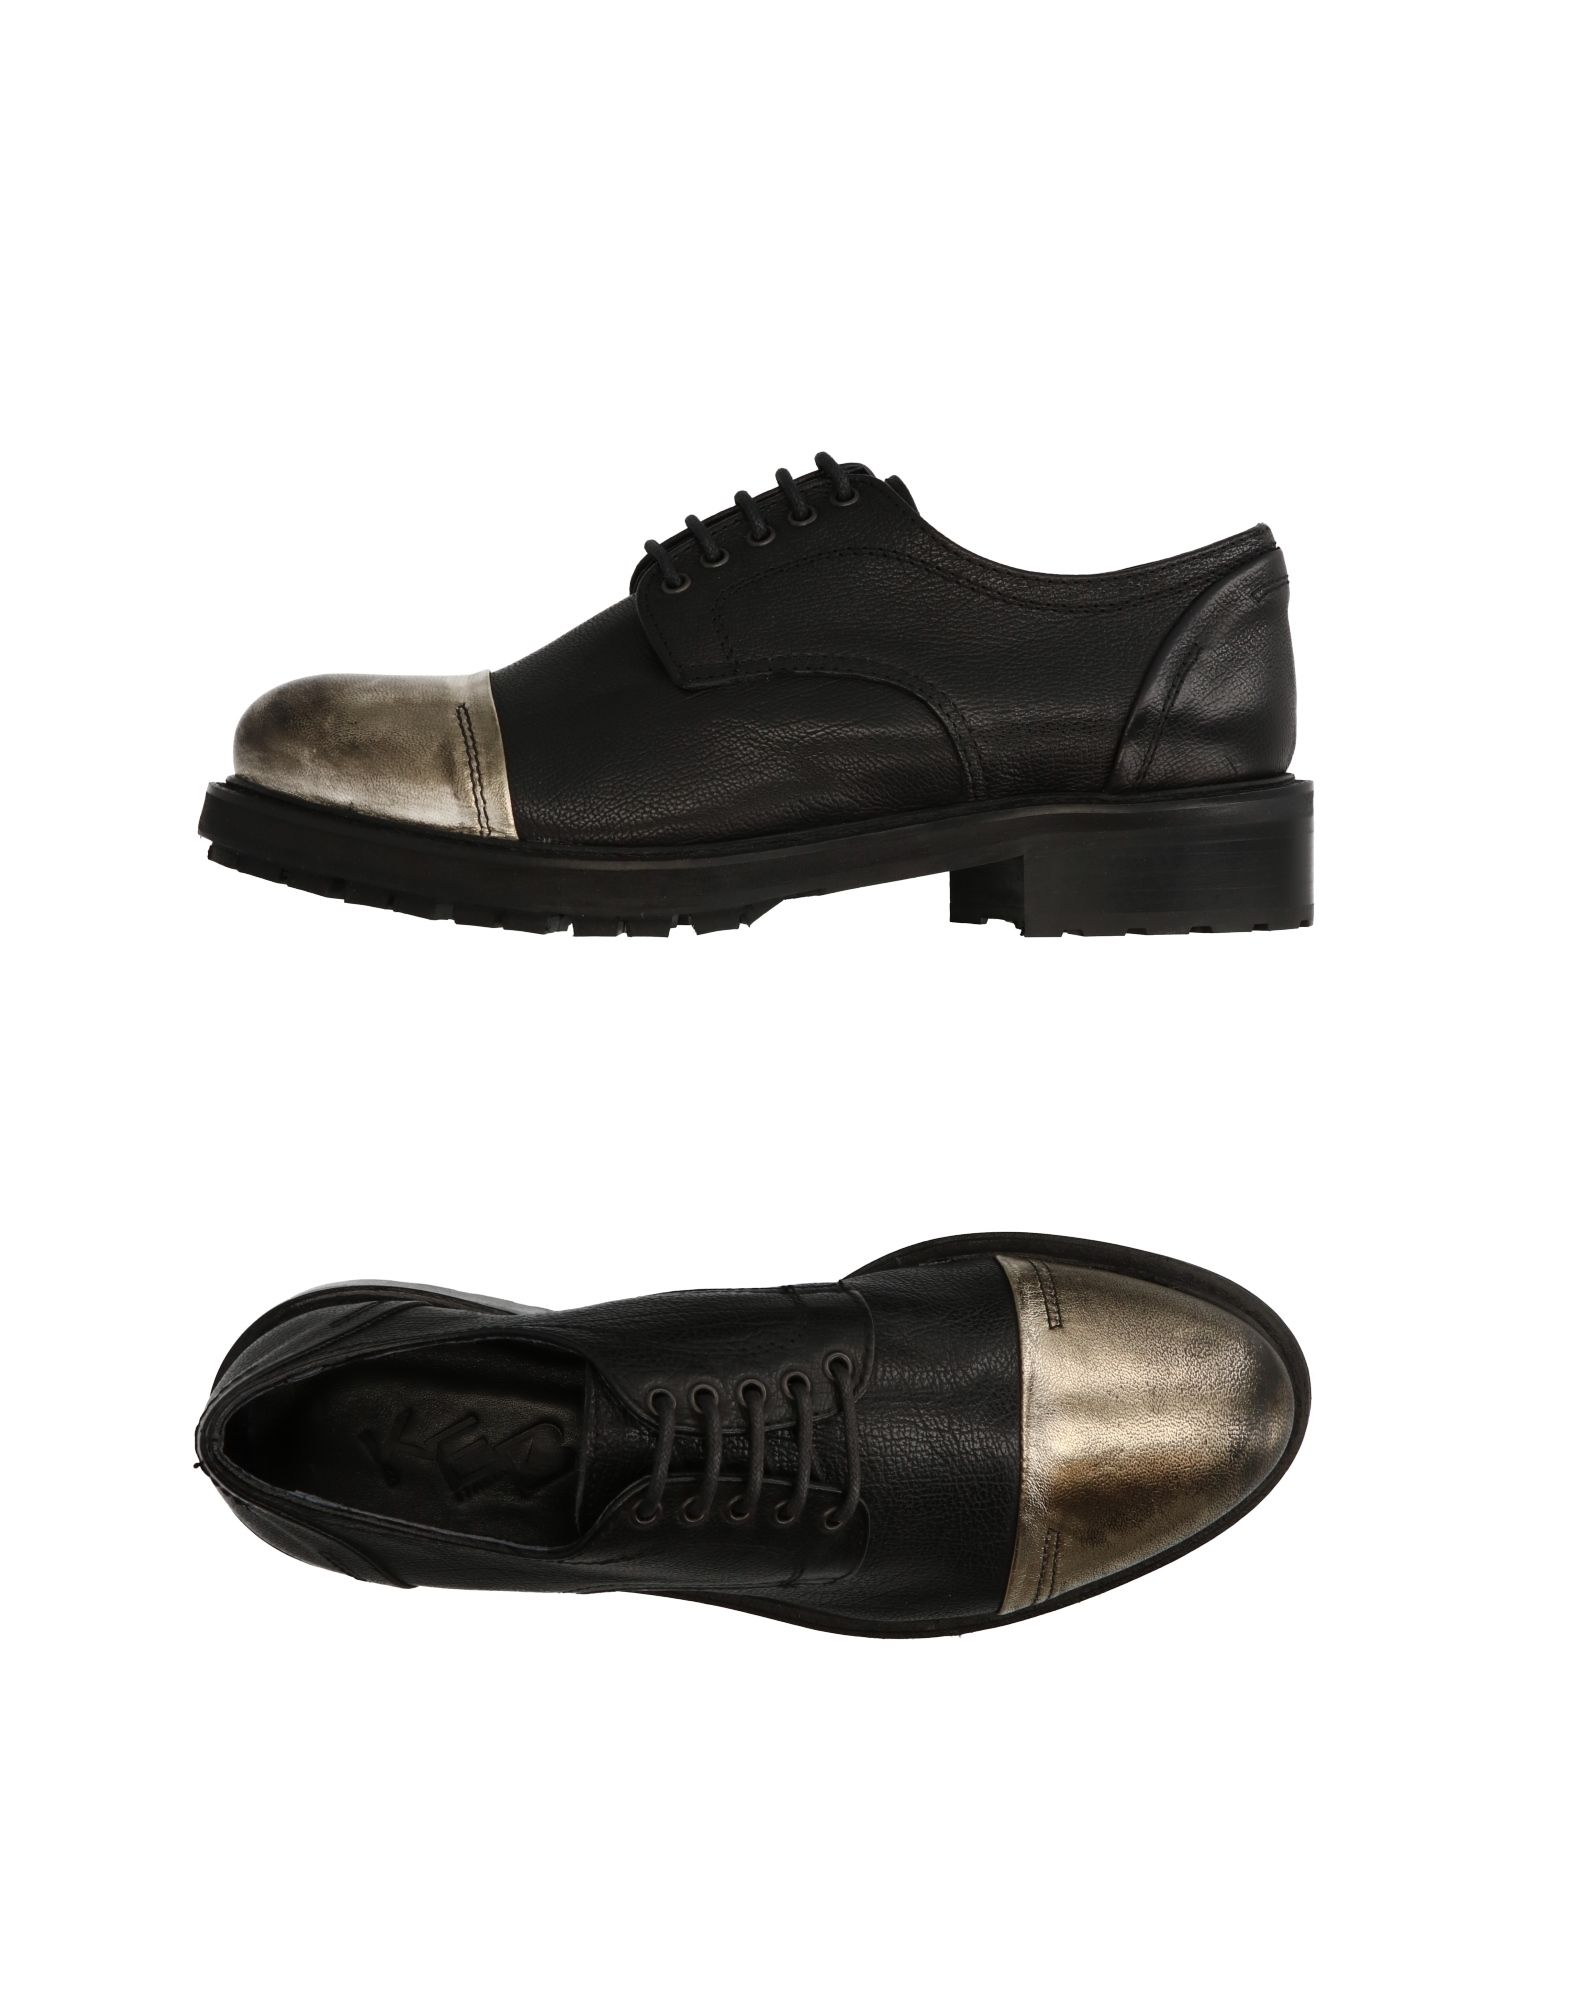 Keb Schnürschuhe Damen  11262931PS Gute Qualität beliebte Schuhe